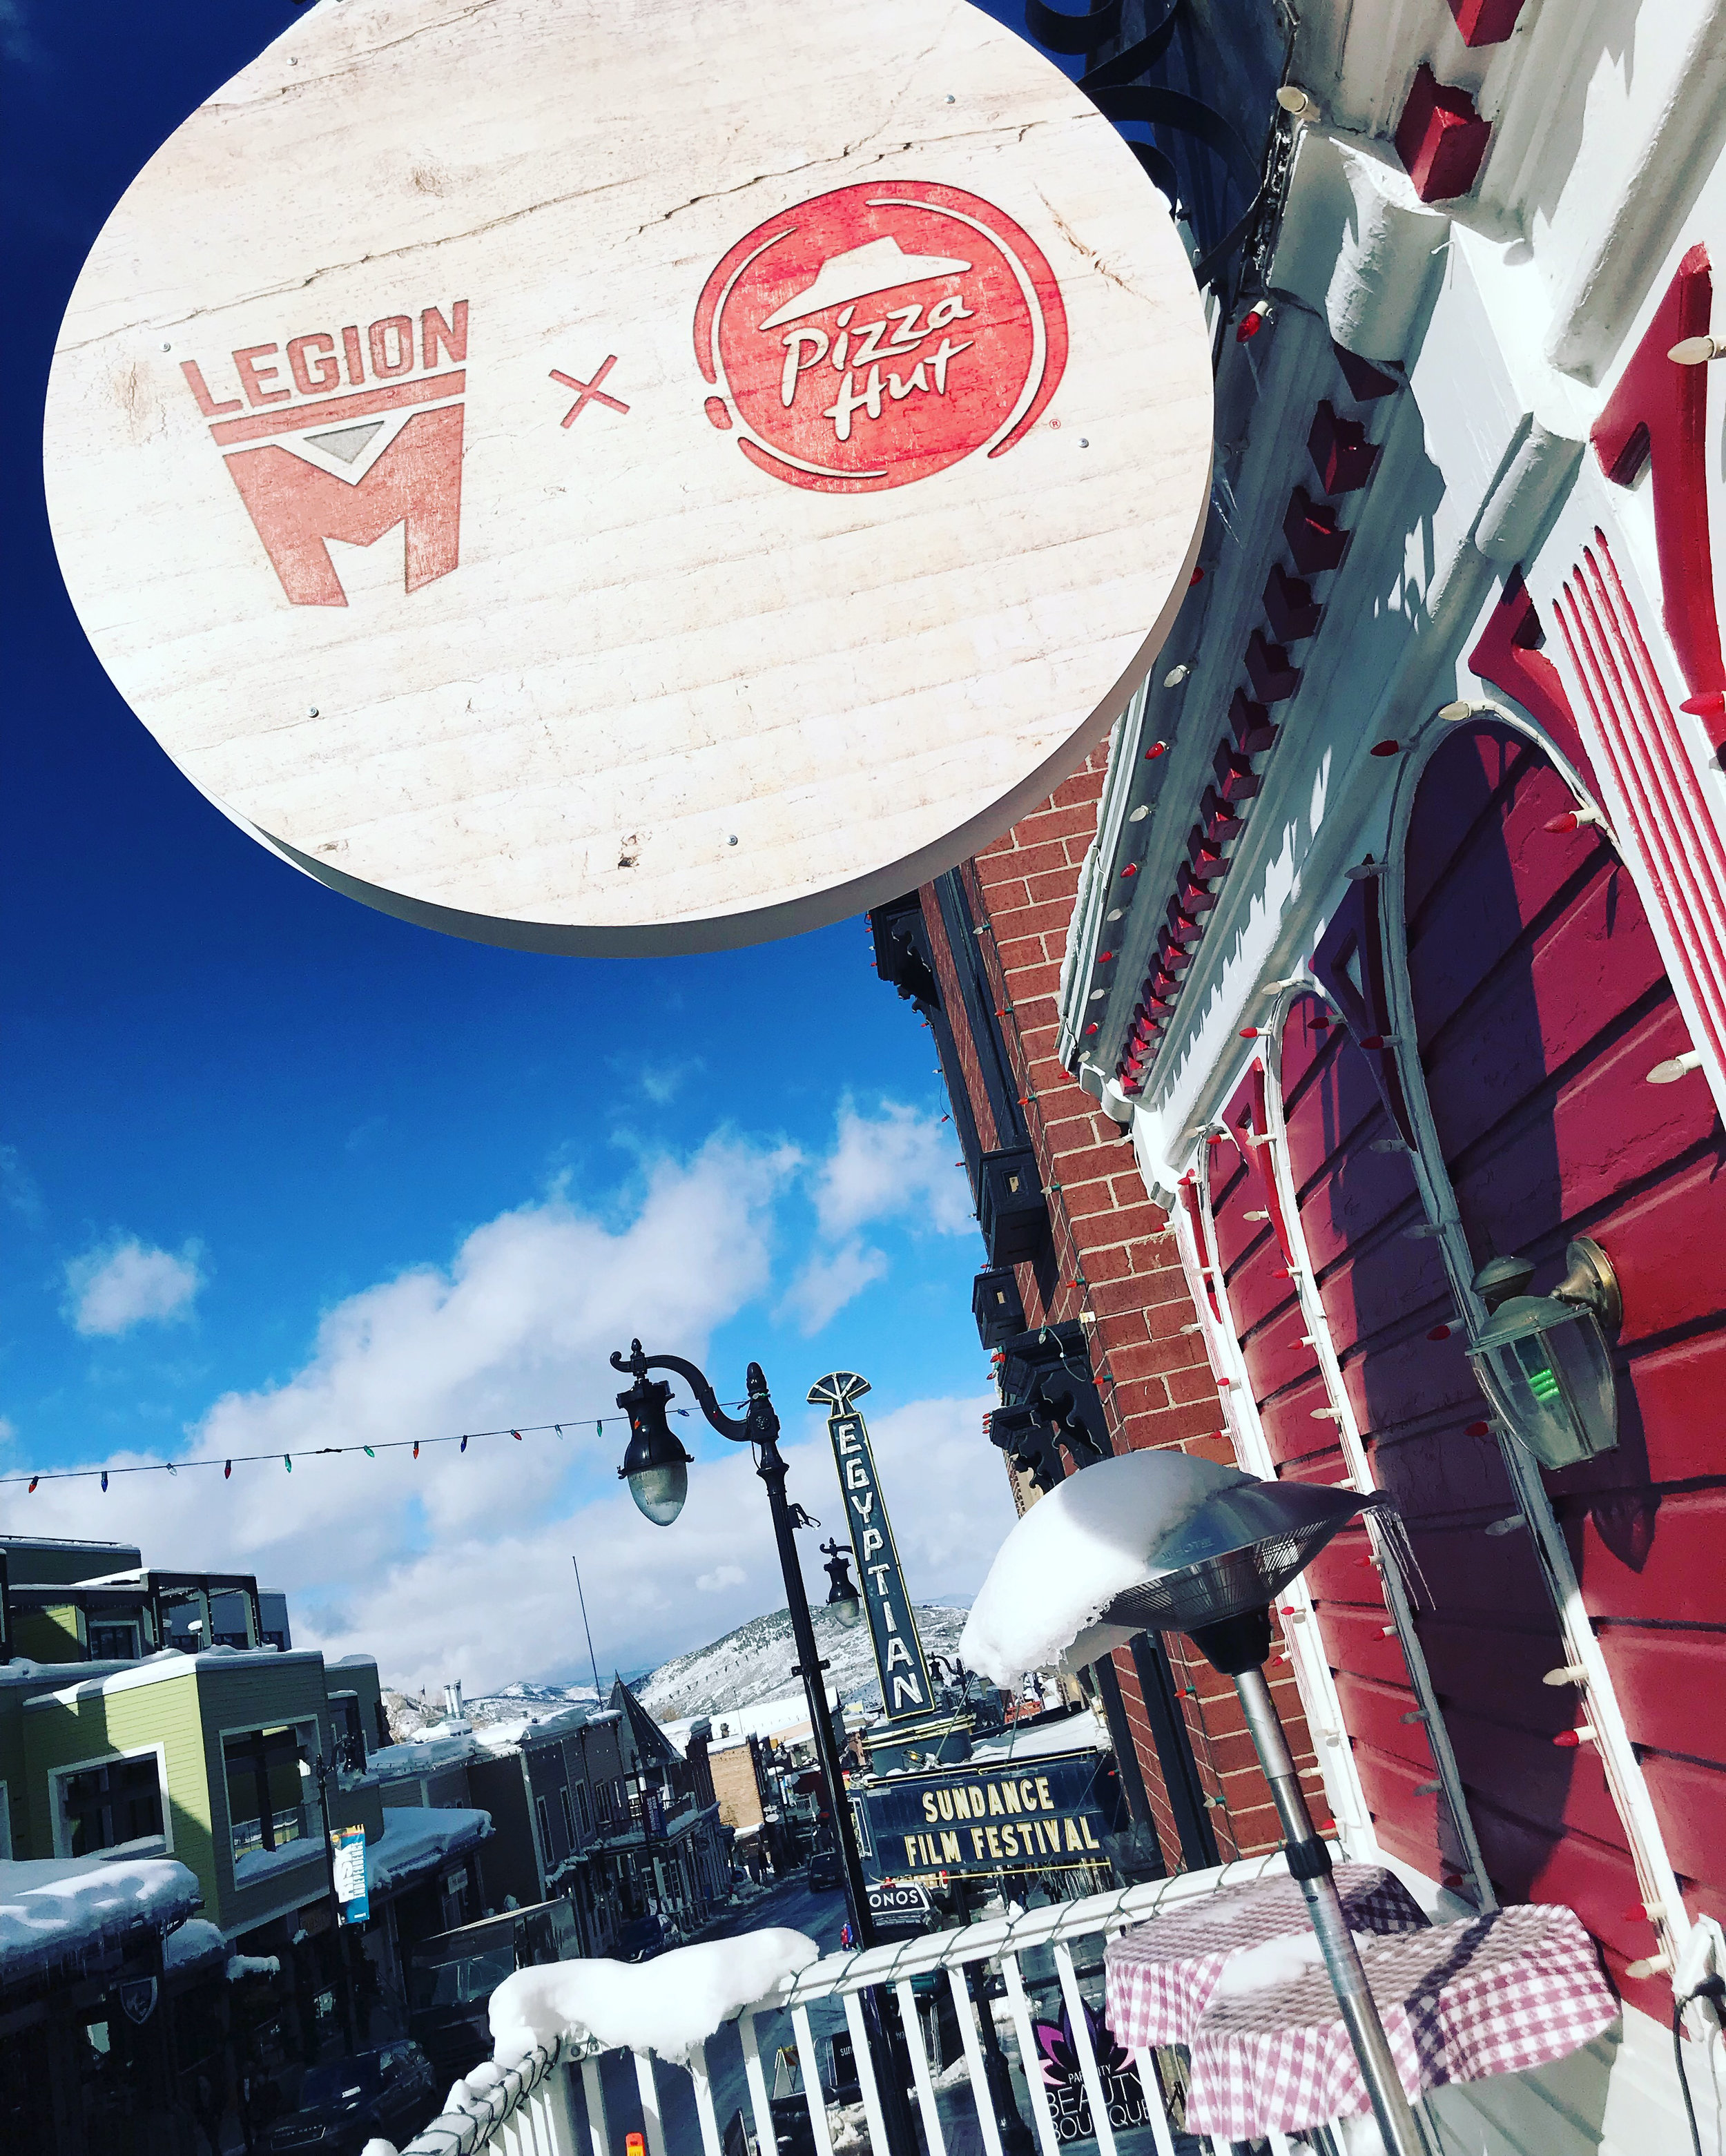 The Pizza Hut x Legion M lounge at Sundance 2019!